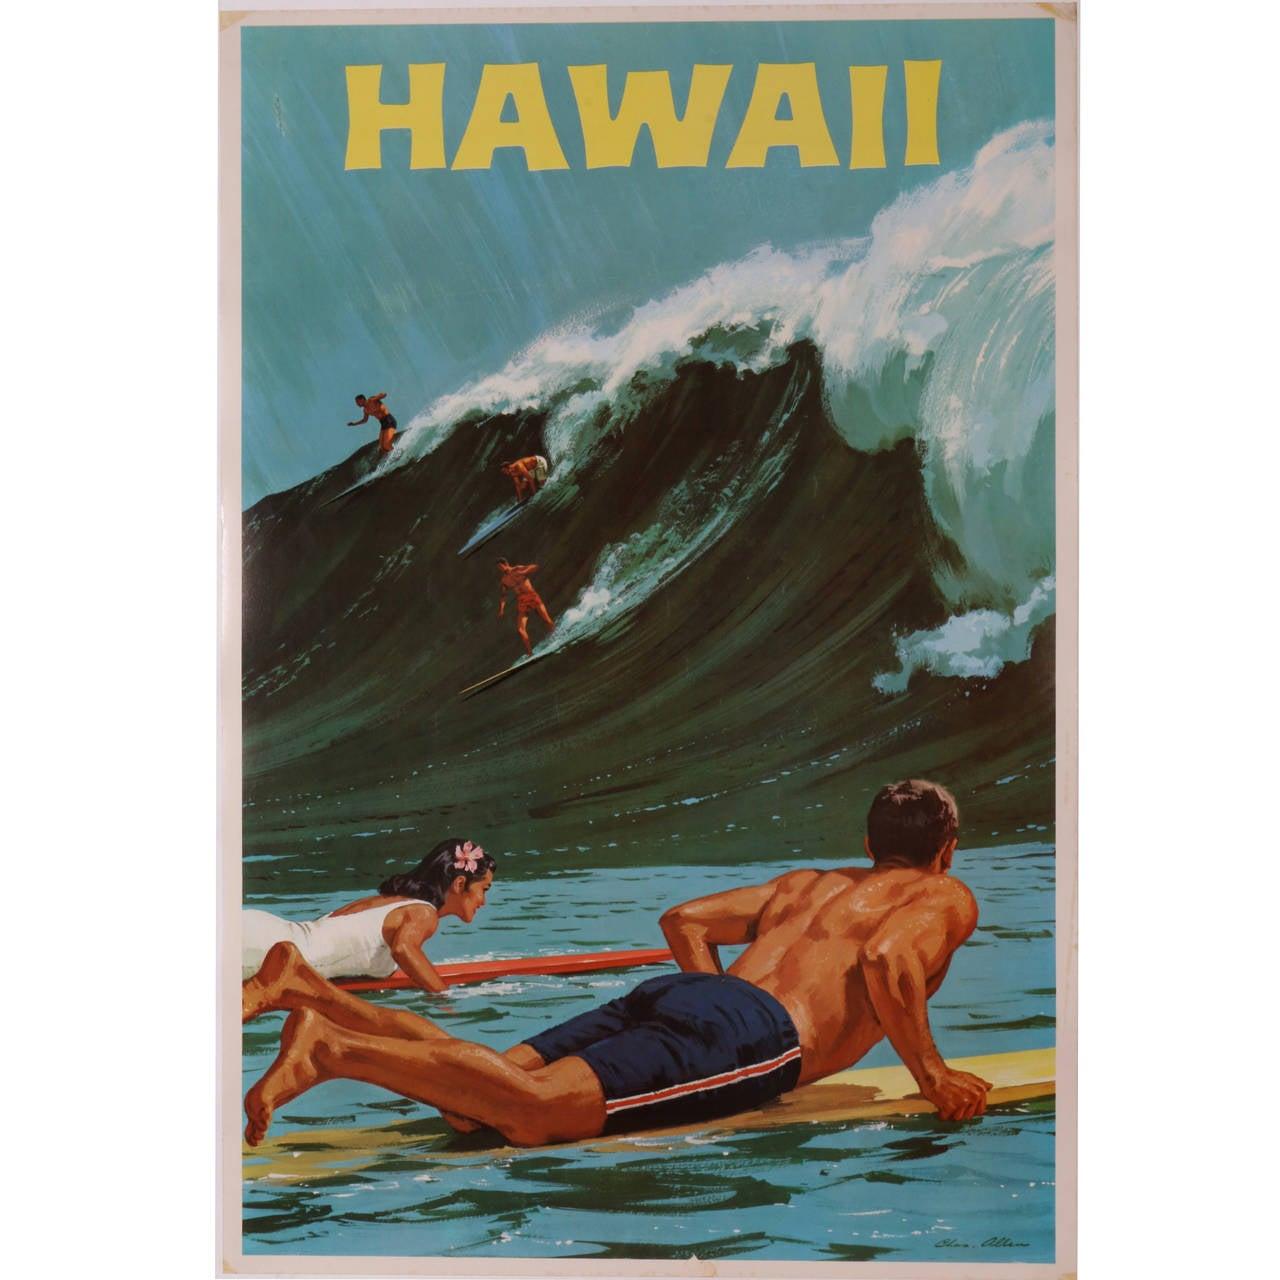 Rare Original Hawaii Surf Poster By Chas Allen Circa 1958